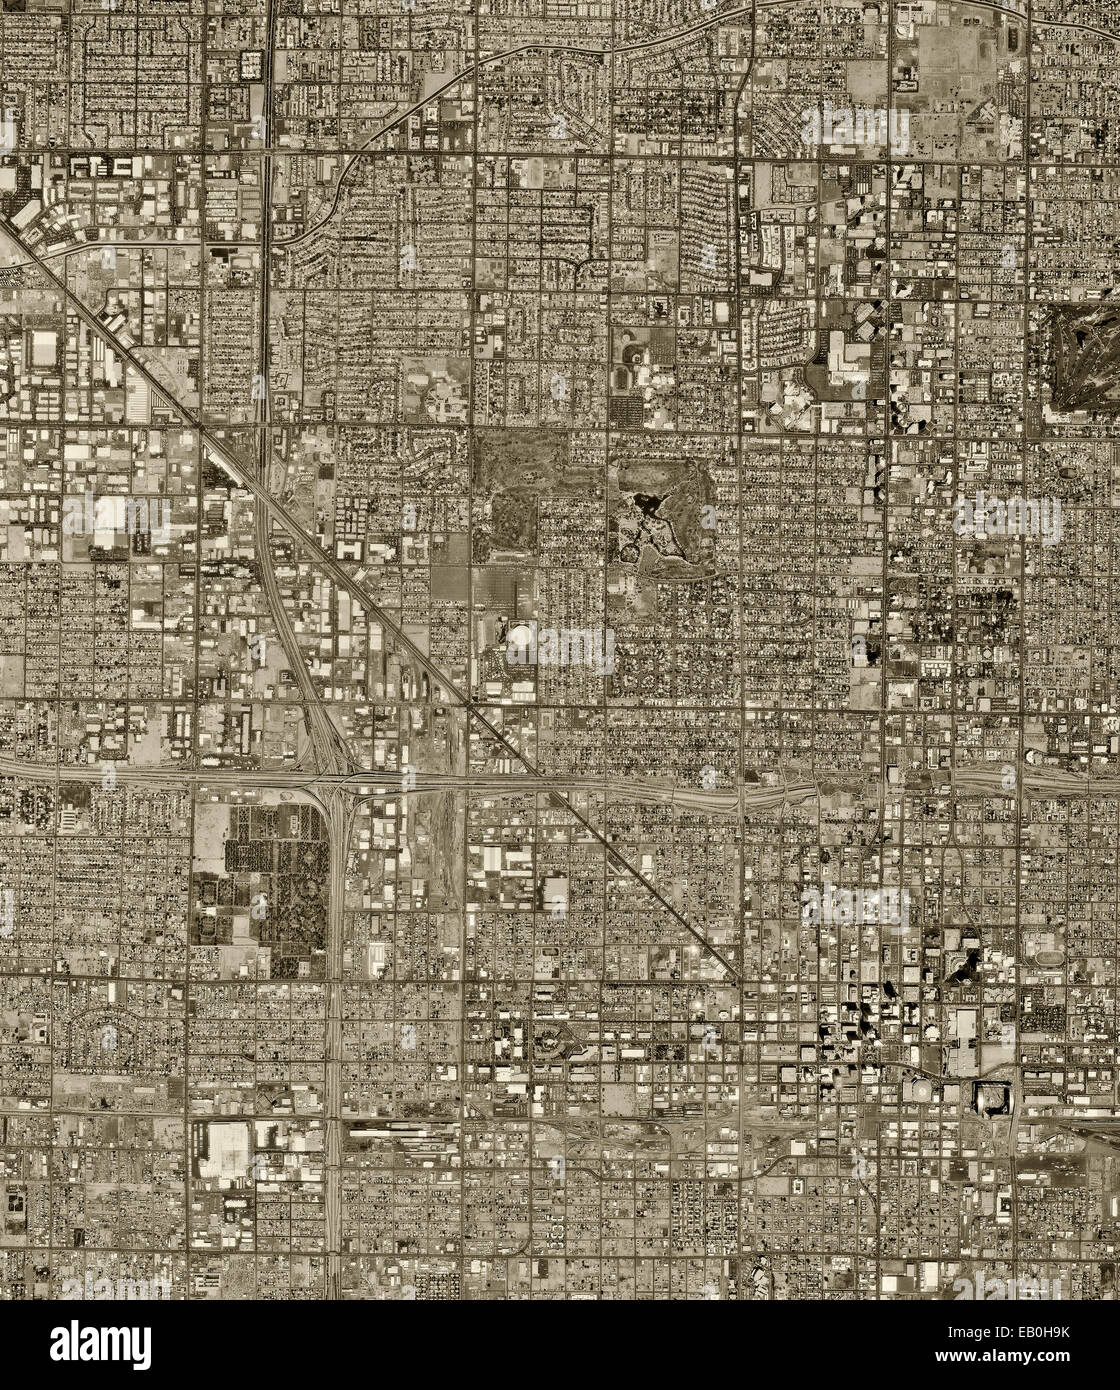 historical aerial photograph of Phoenix, Arizona, 1997 - Stock Image